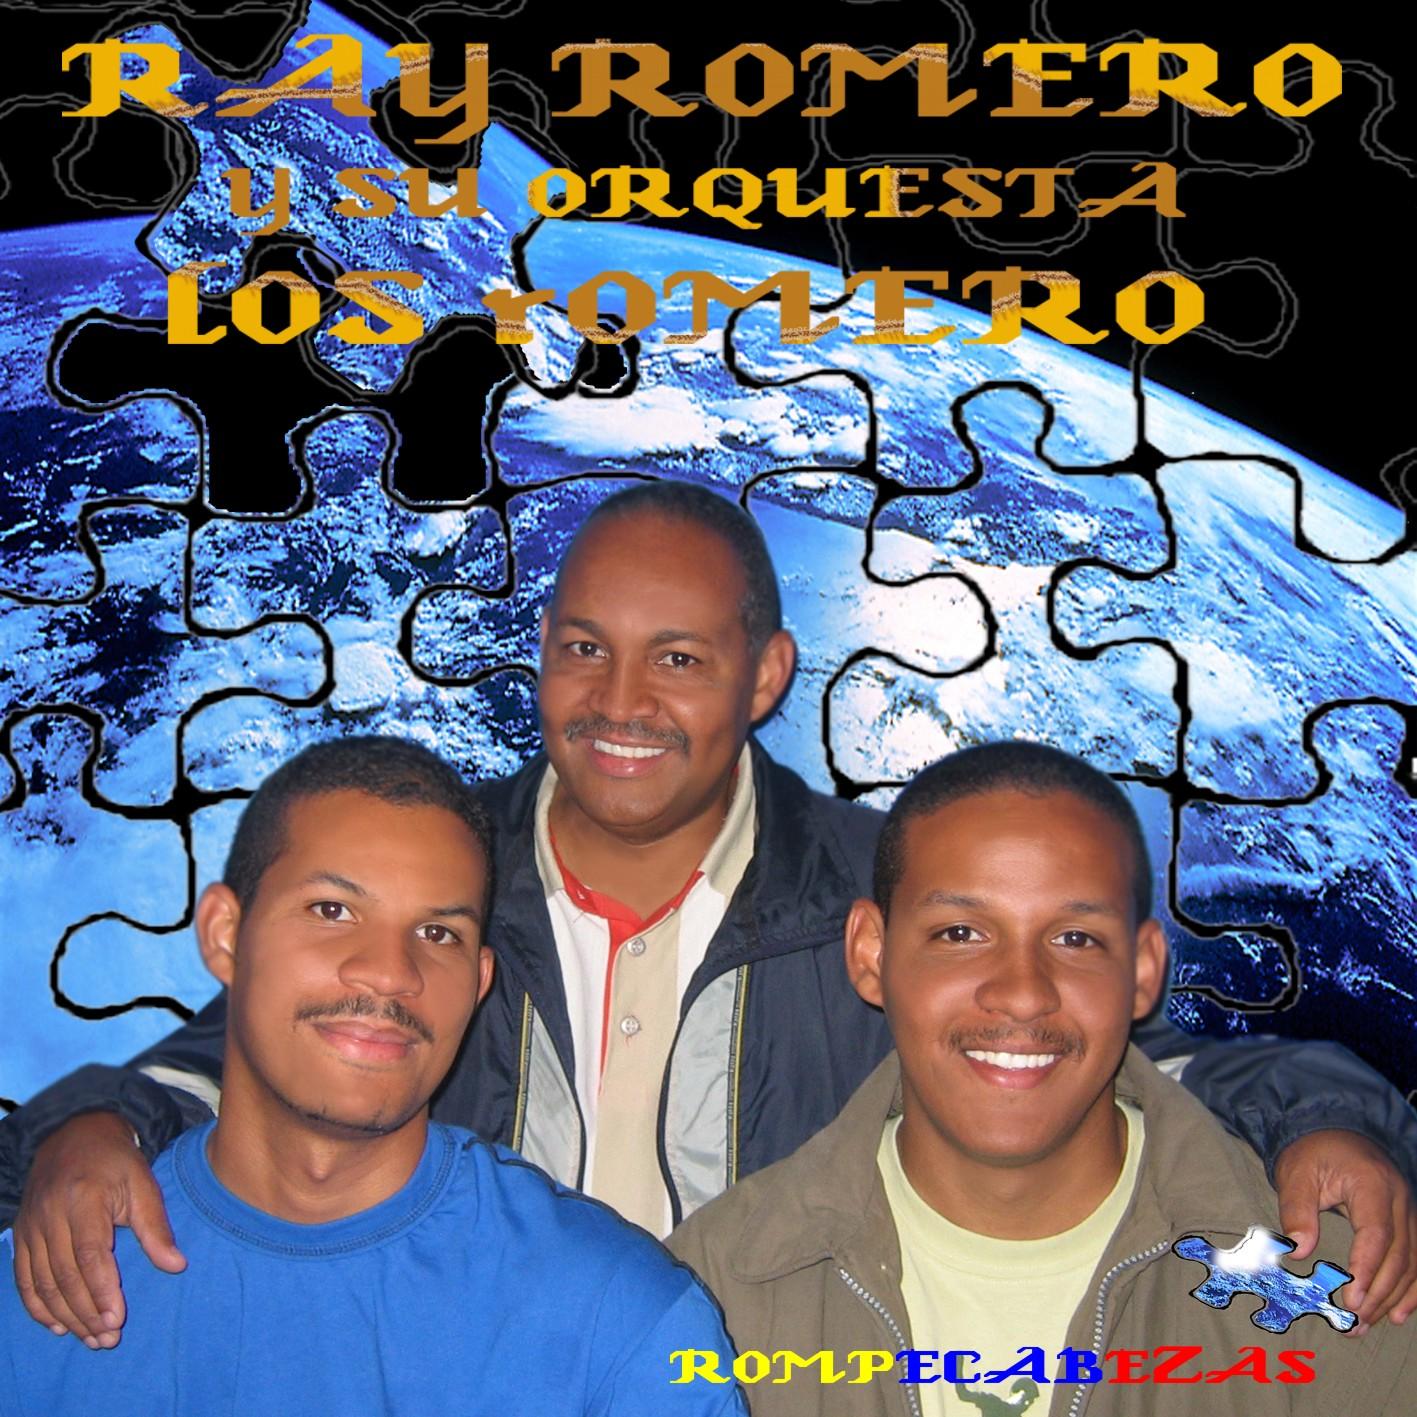 ORQUESTA LOS ROMERO